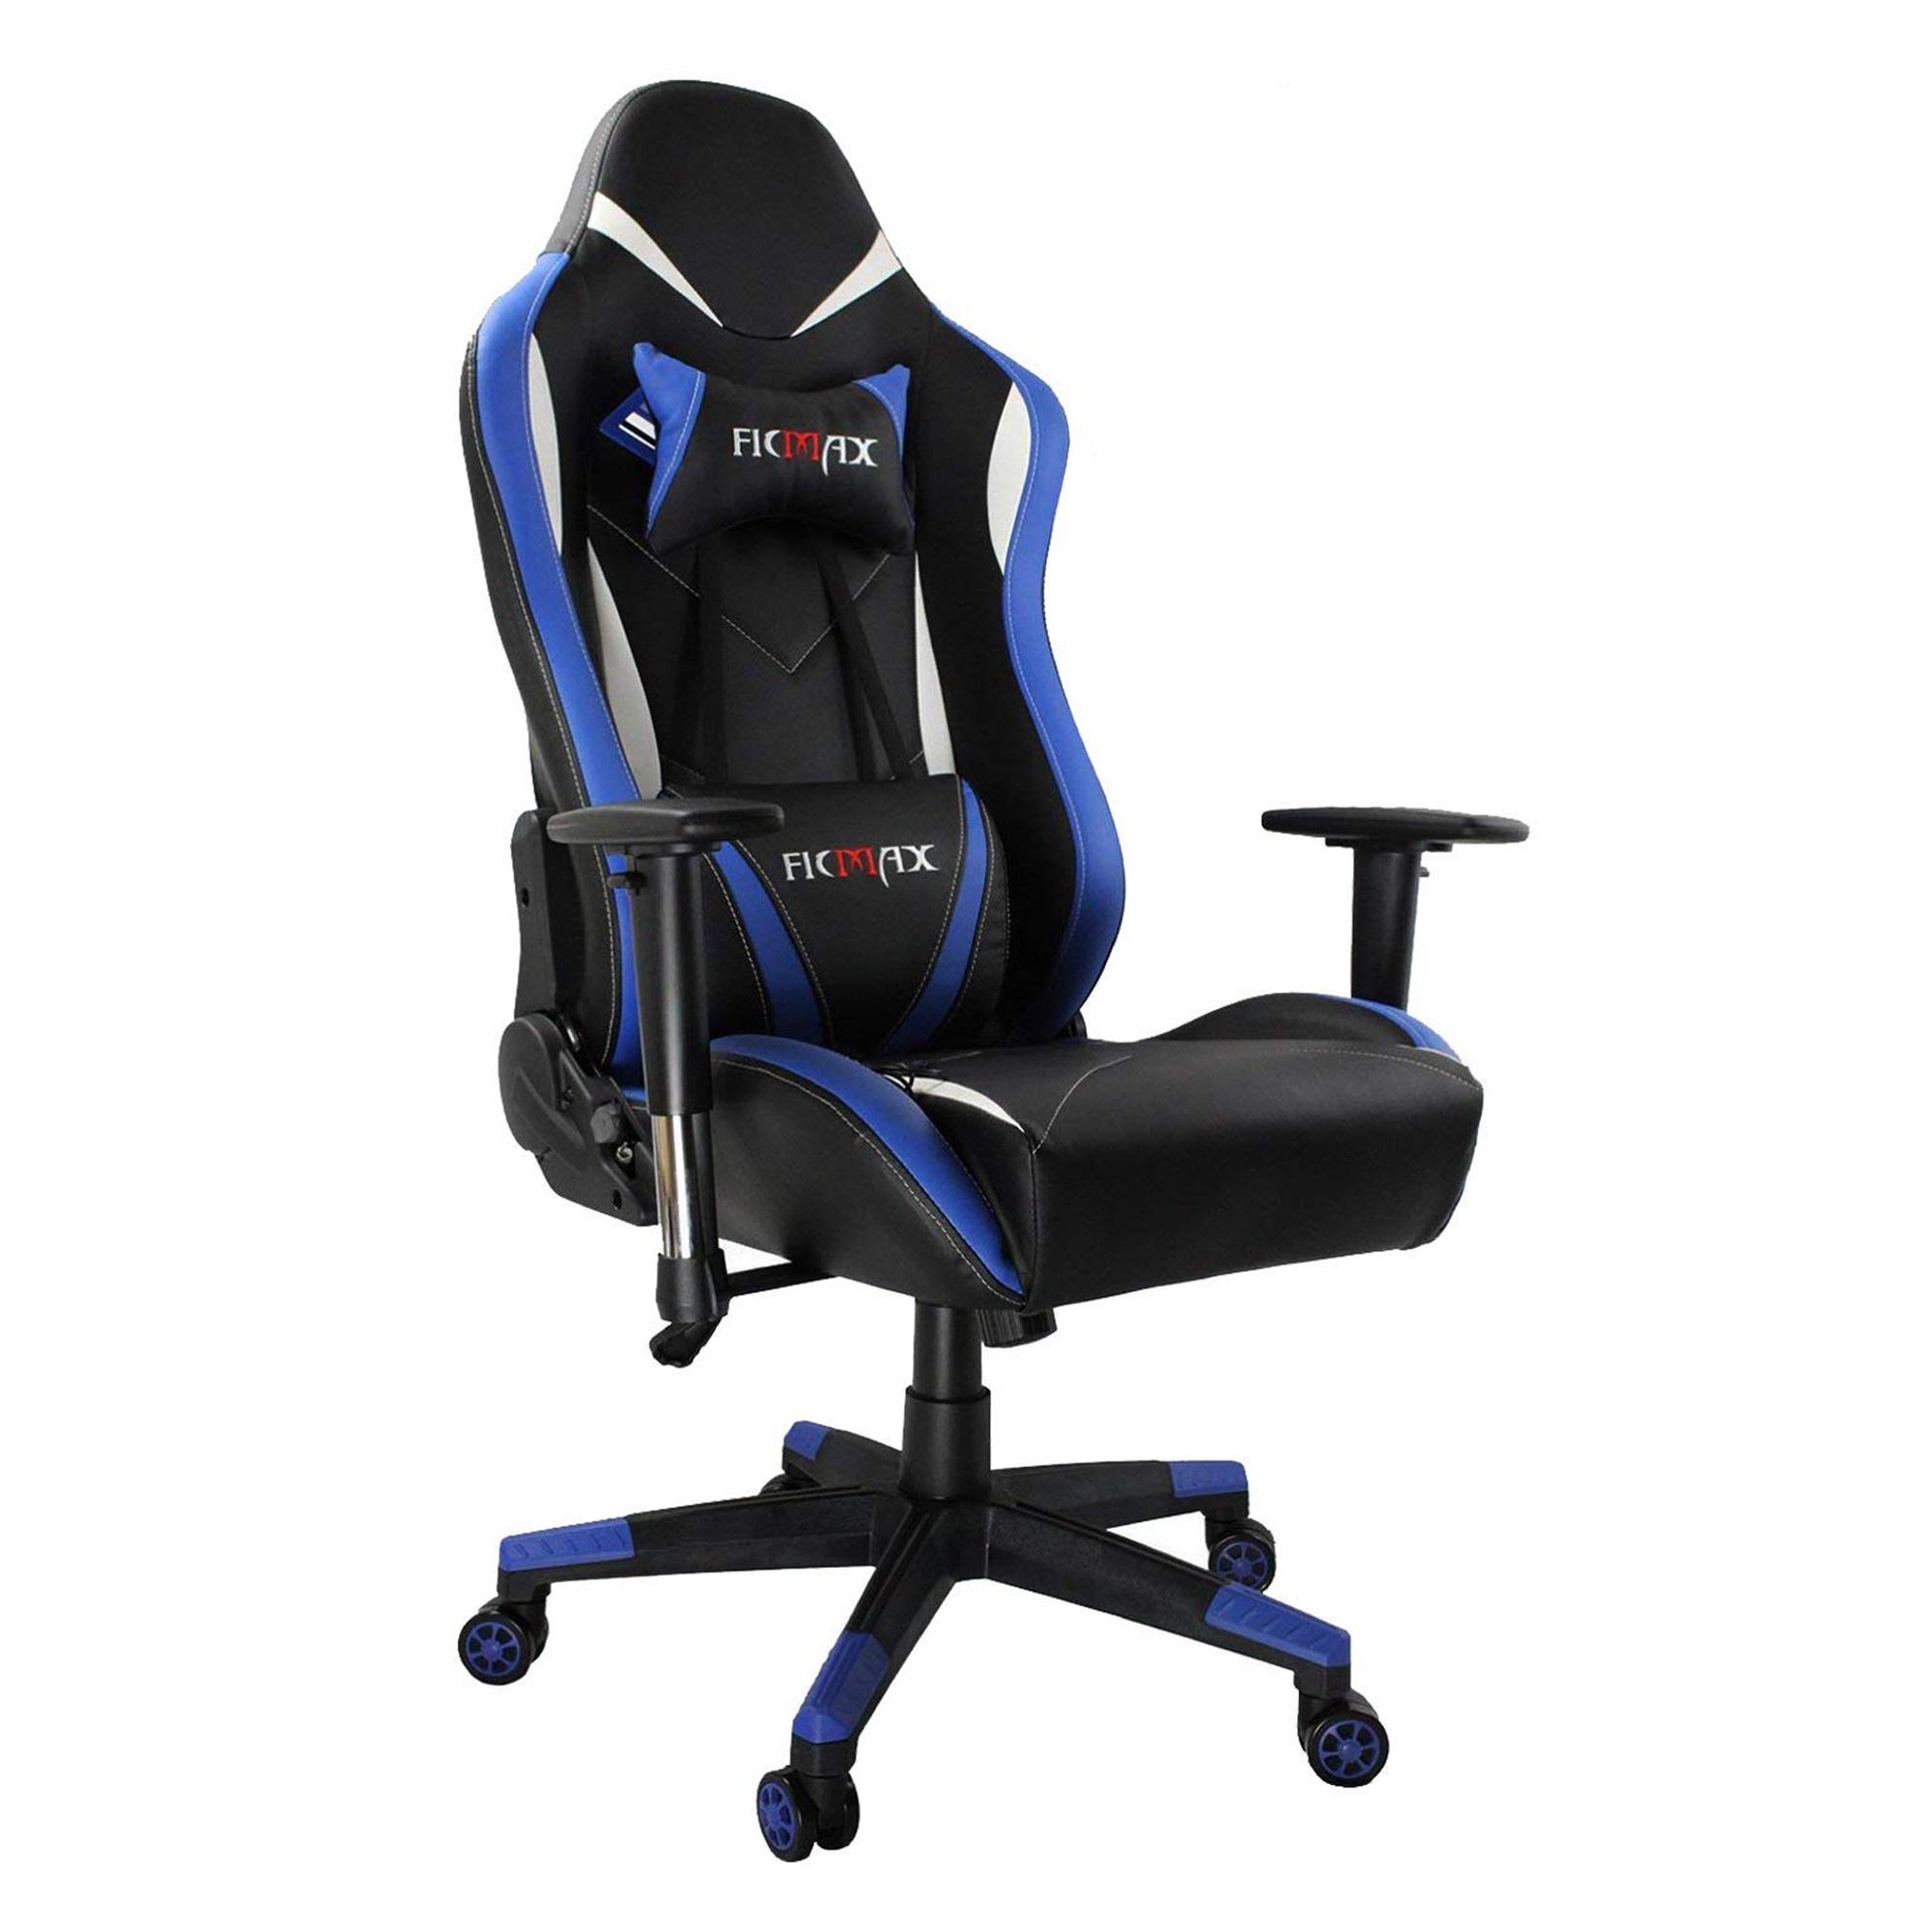 Details About Ergonomic Racing Gaming Chair High Back Computer Seat Swivel  Massage Lumbar